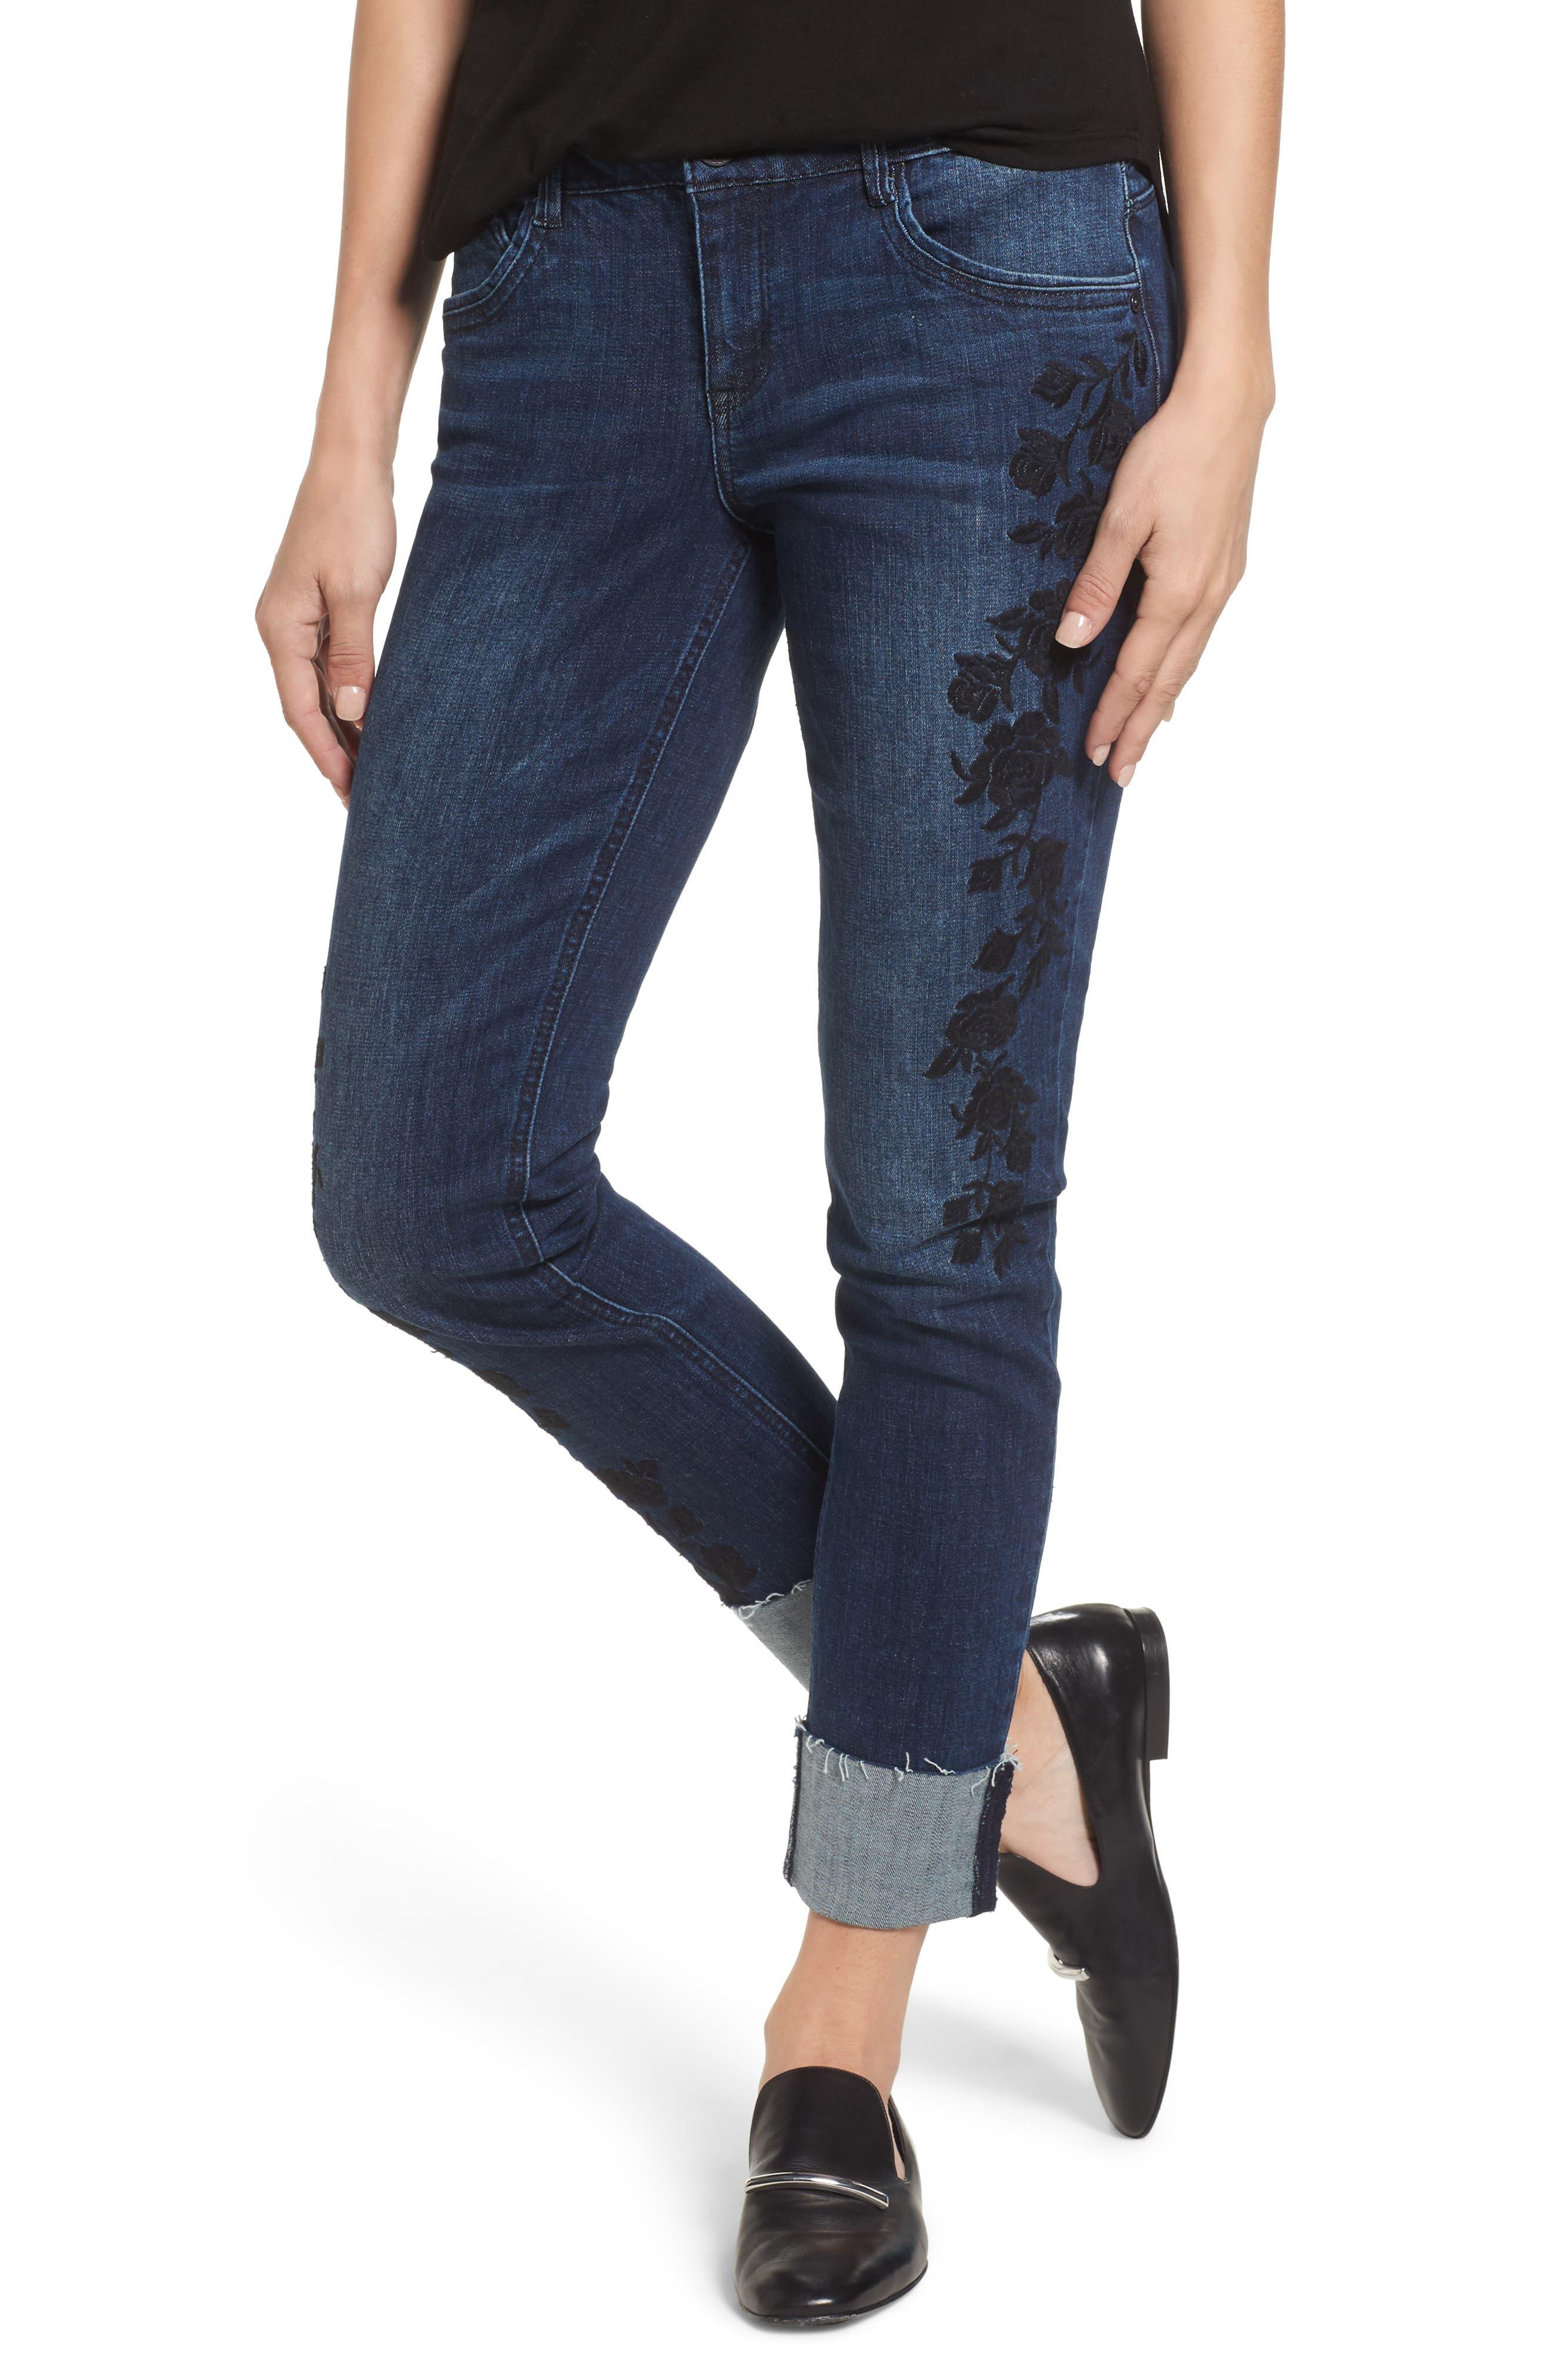 Wit & Wisdom Flexellent Embroidered Boyfriend Jeans (Regular & Petite) (Nordstrom Exclusive)